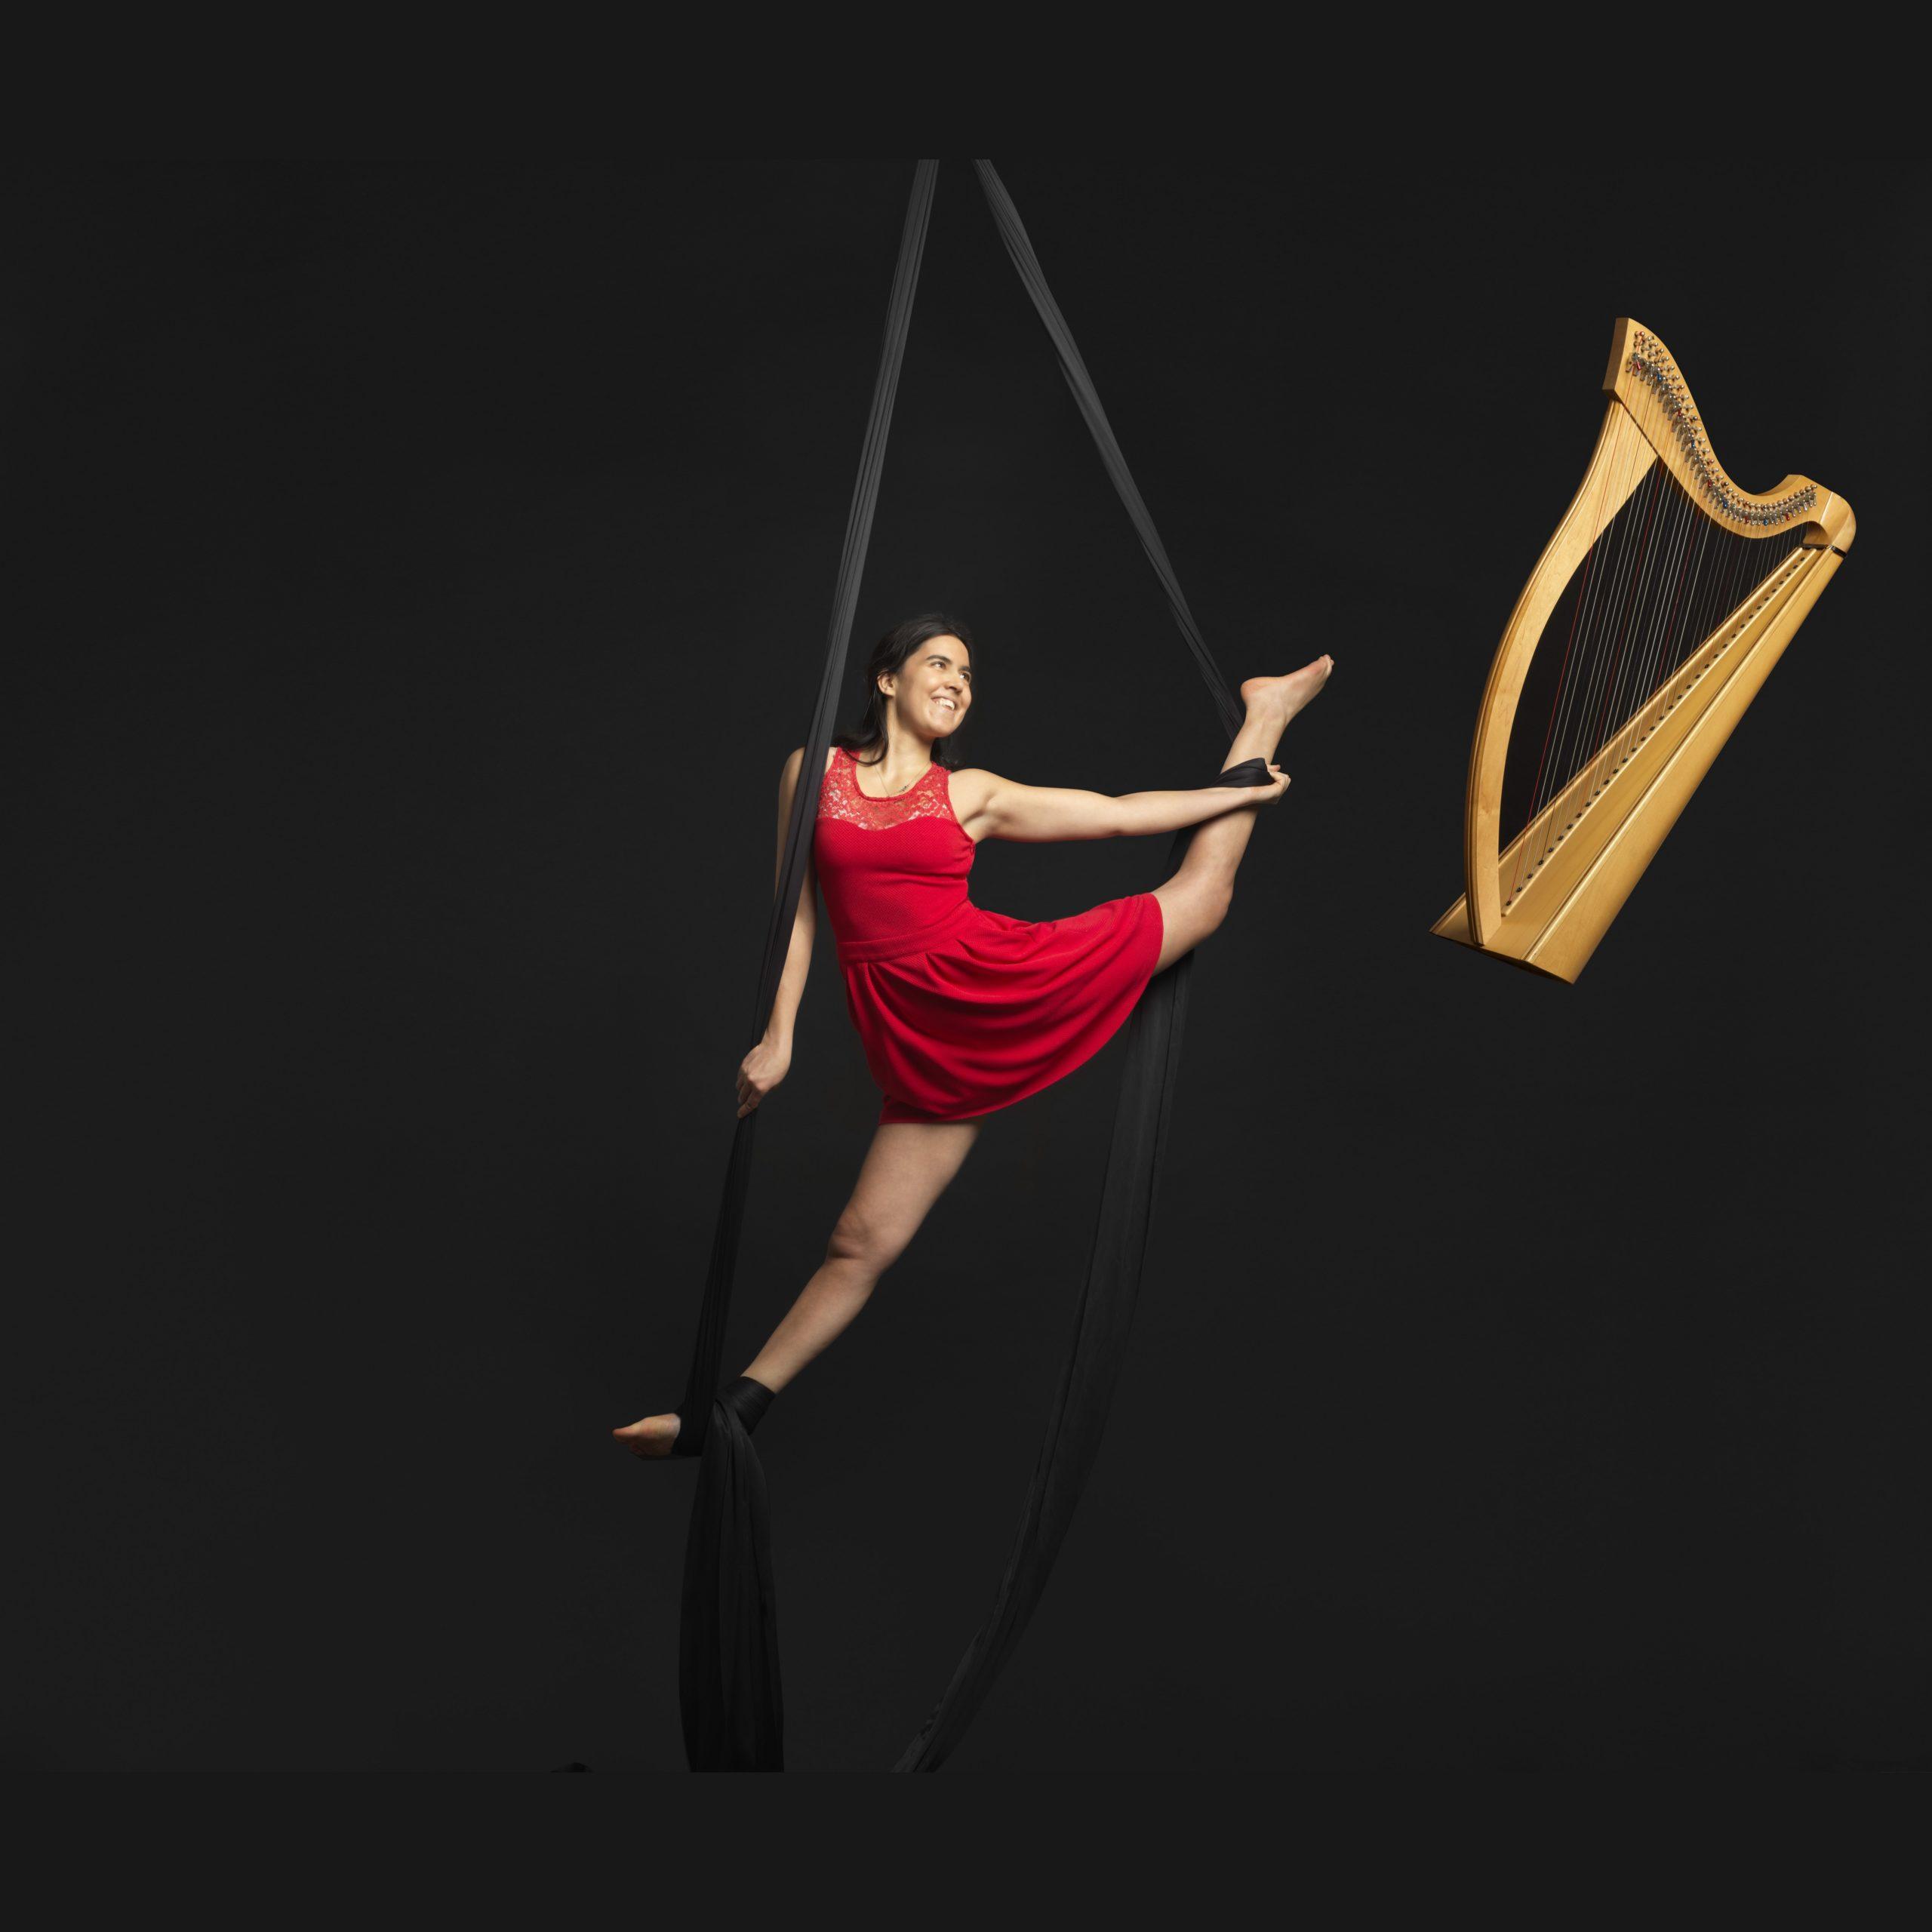 Sophie Mosser – artiste pluridisciplinaire